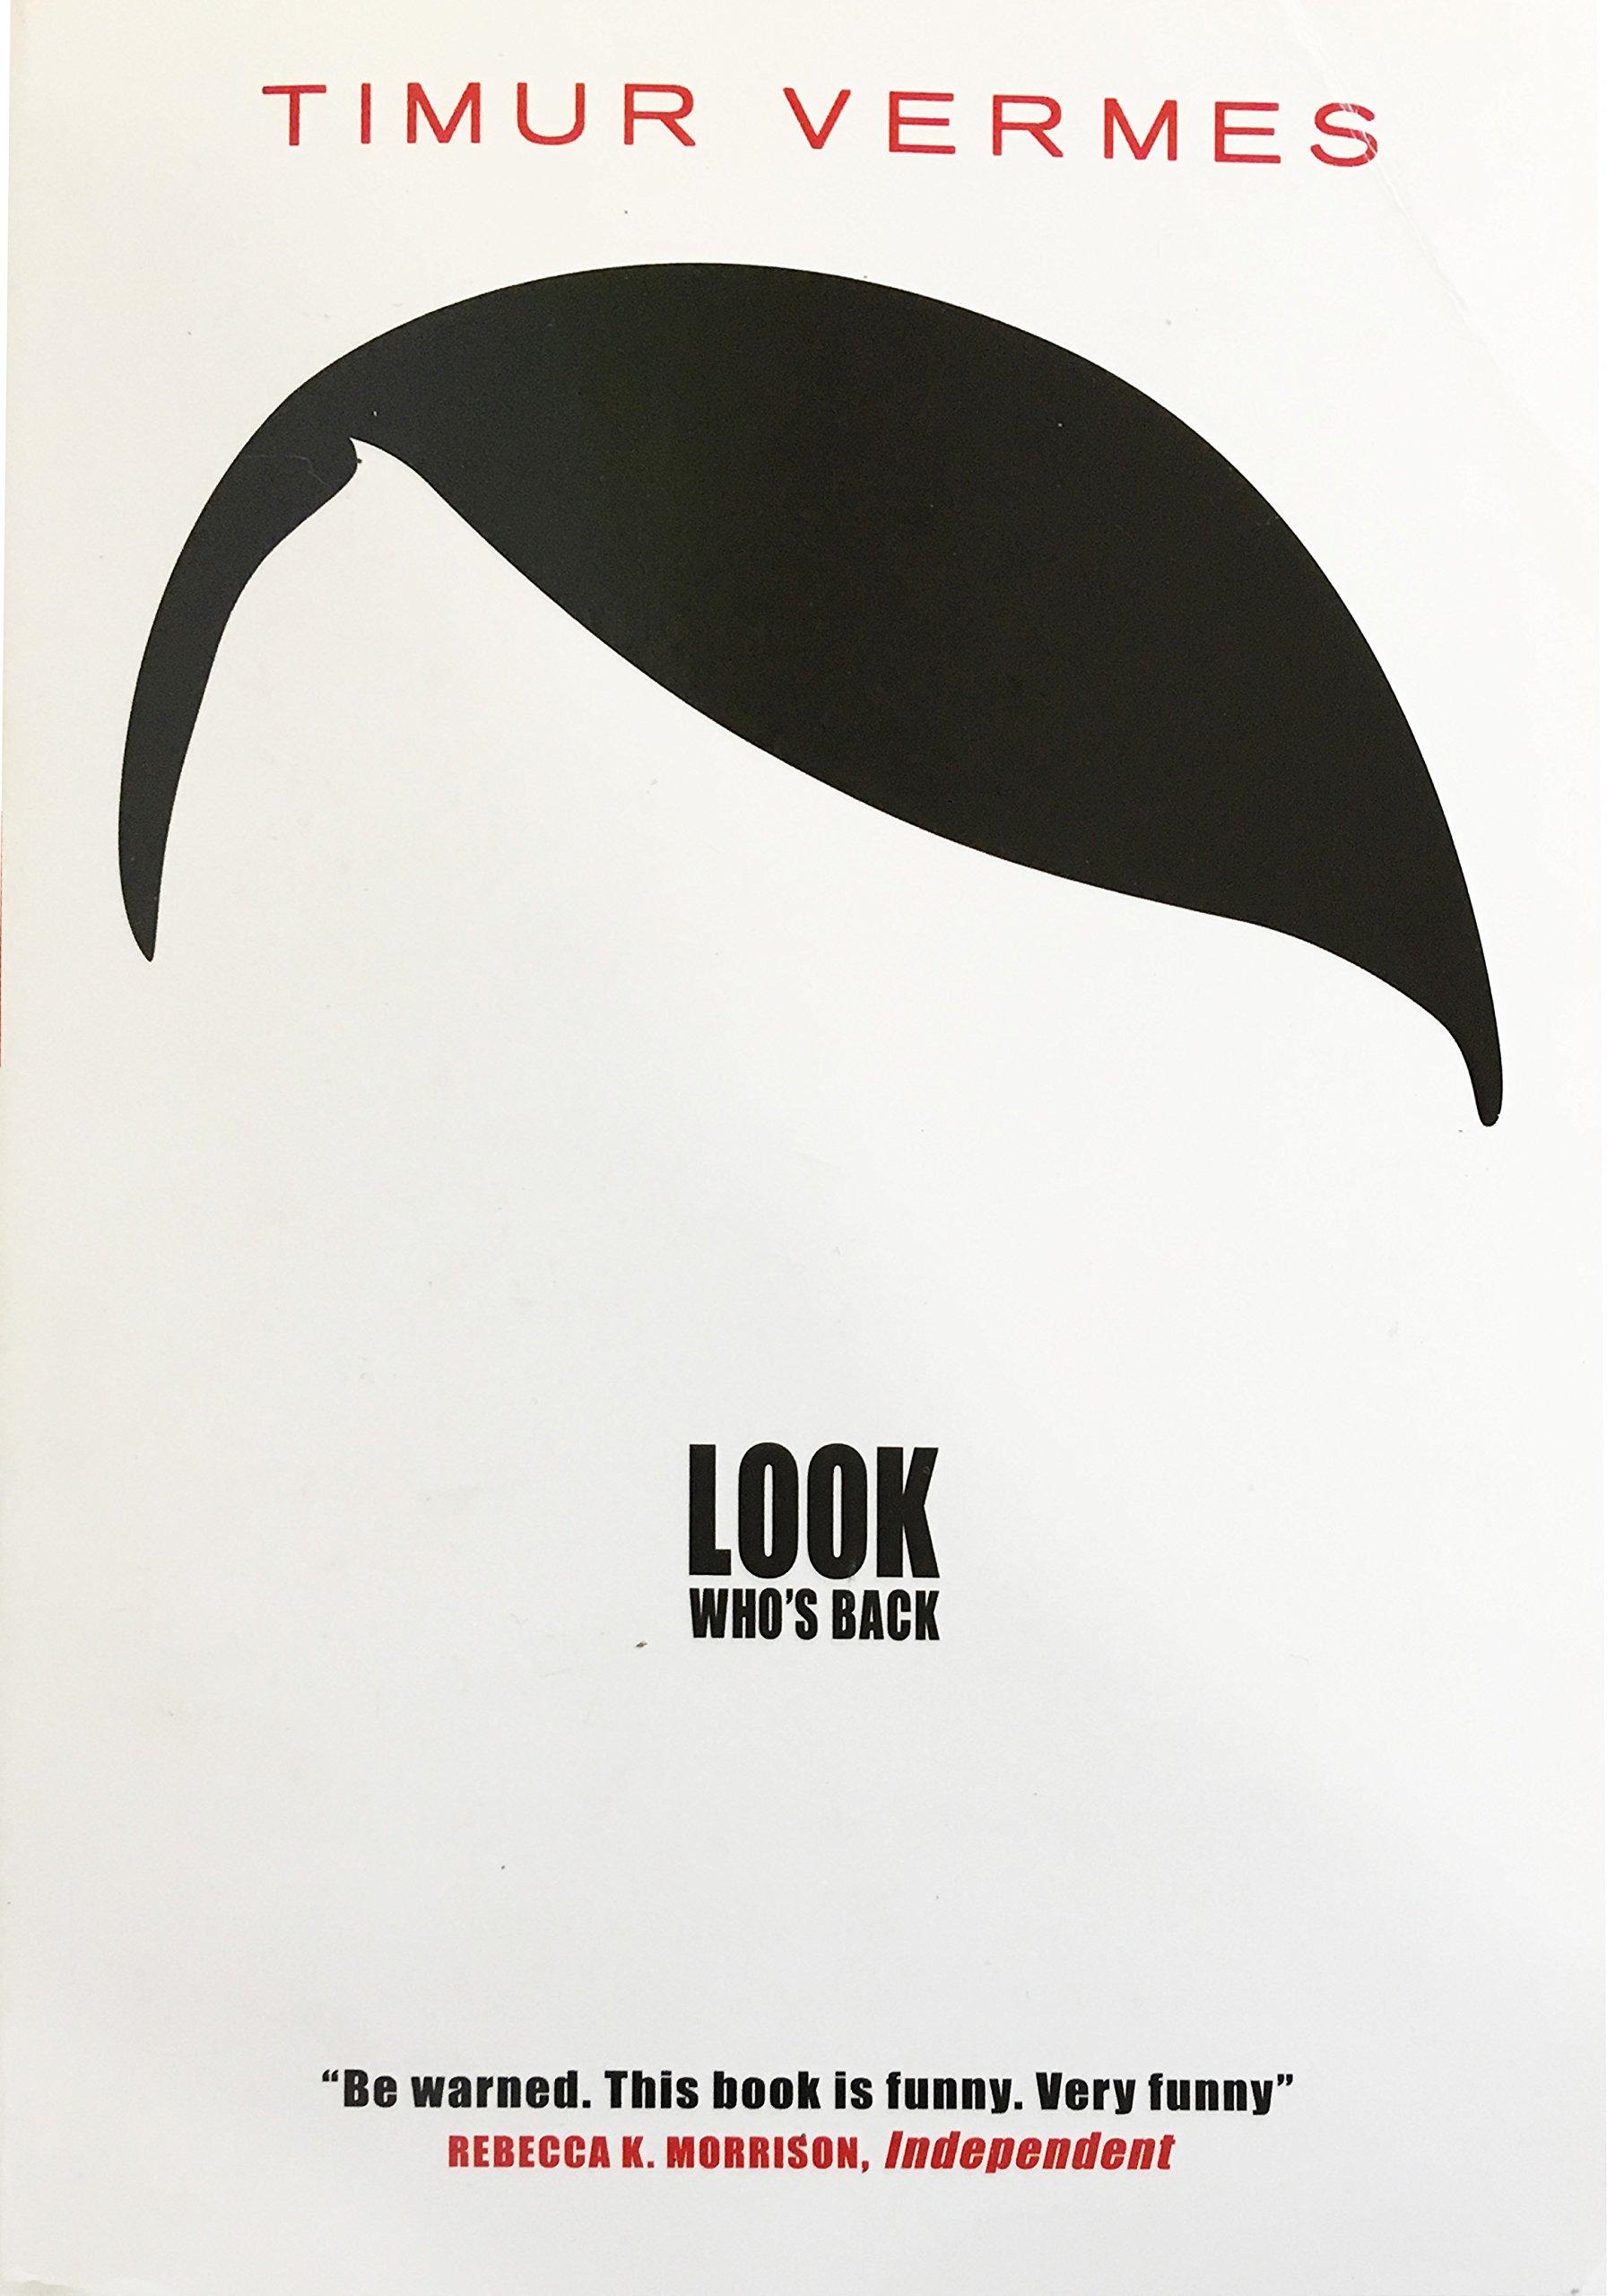 Look Who's Back: Amazon.co.uk: Vermes, Timur, Bulloch, Jamie:  9781782067832: Books